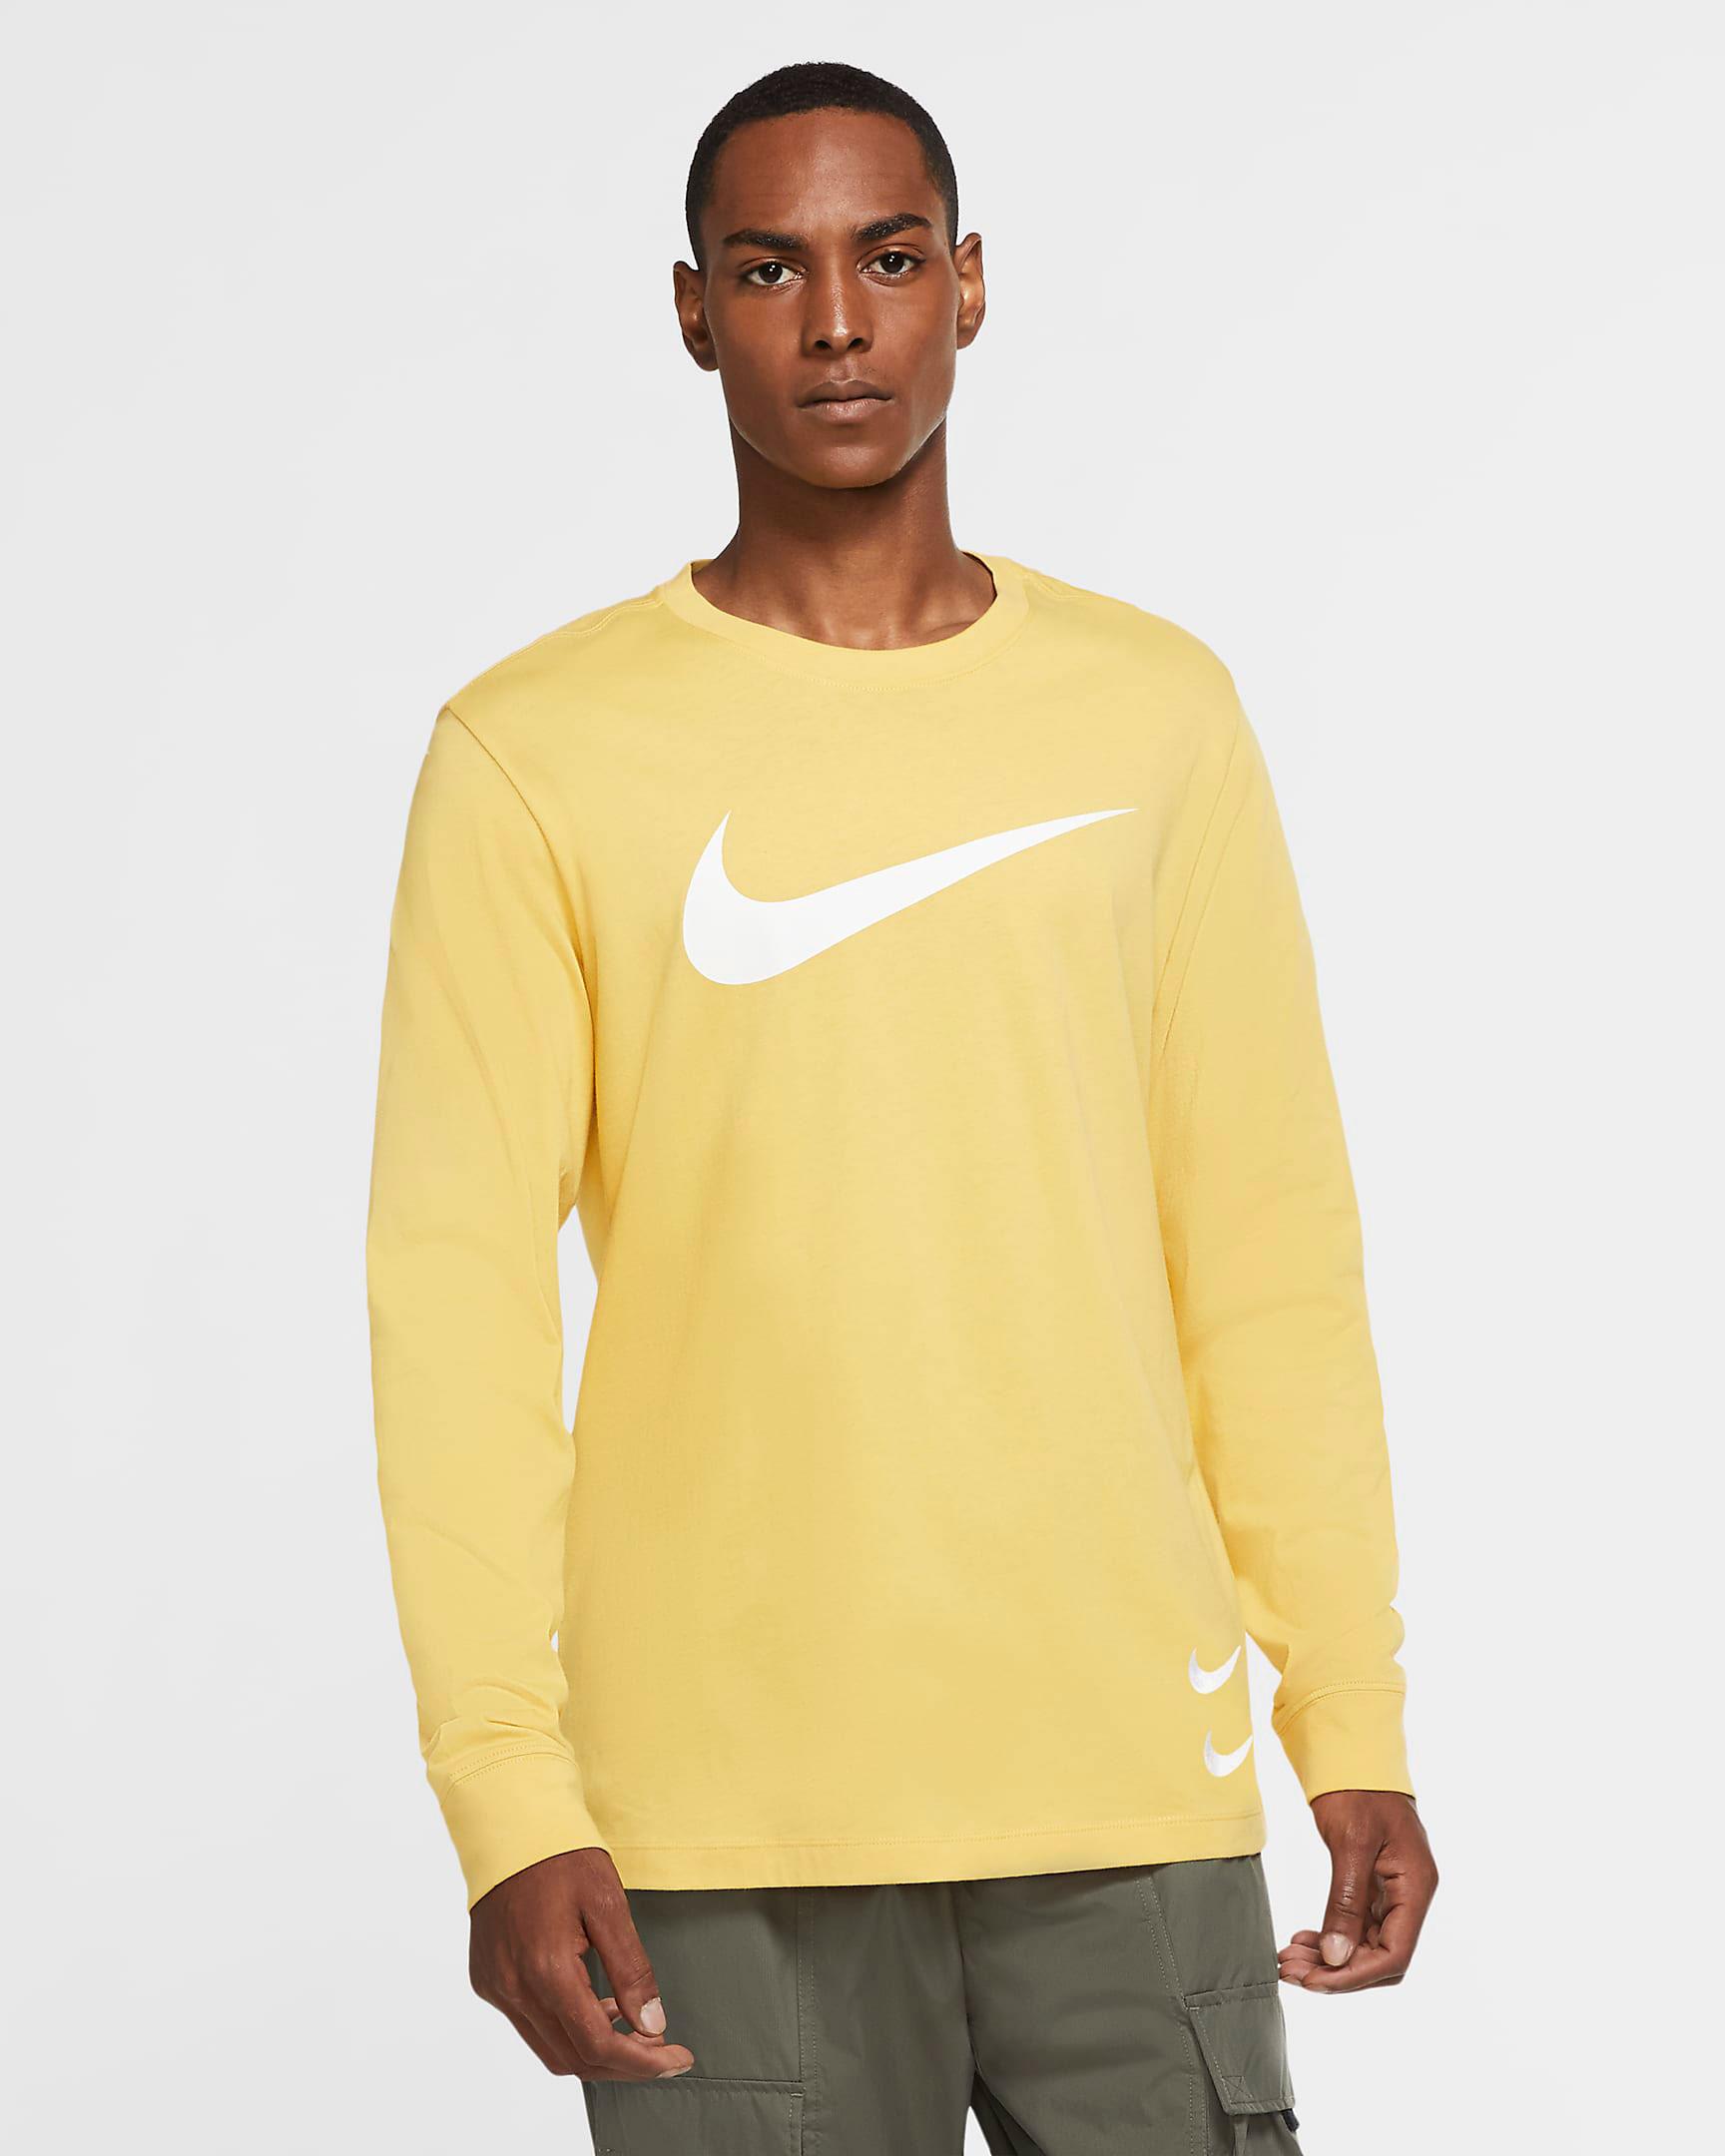 nike-air-max-1-lemonade-shirt-match